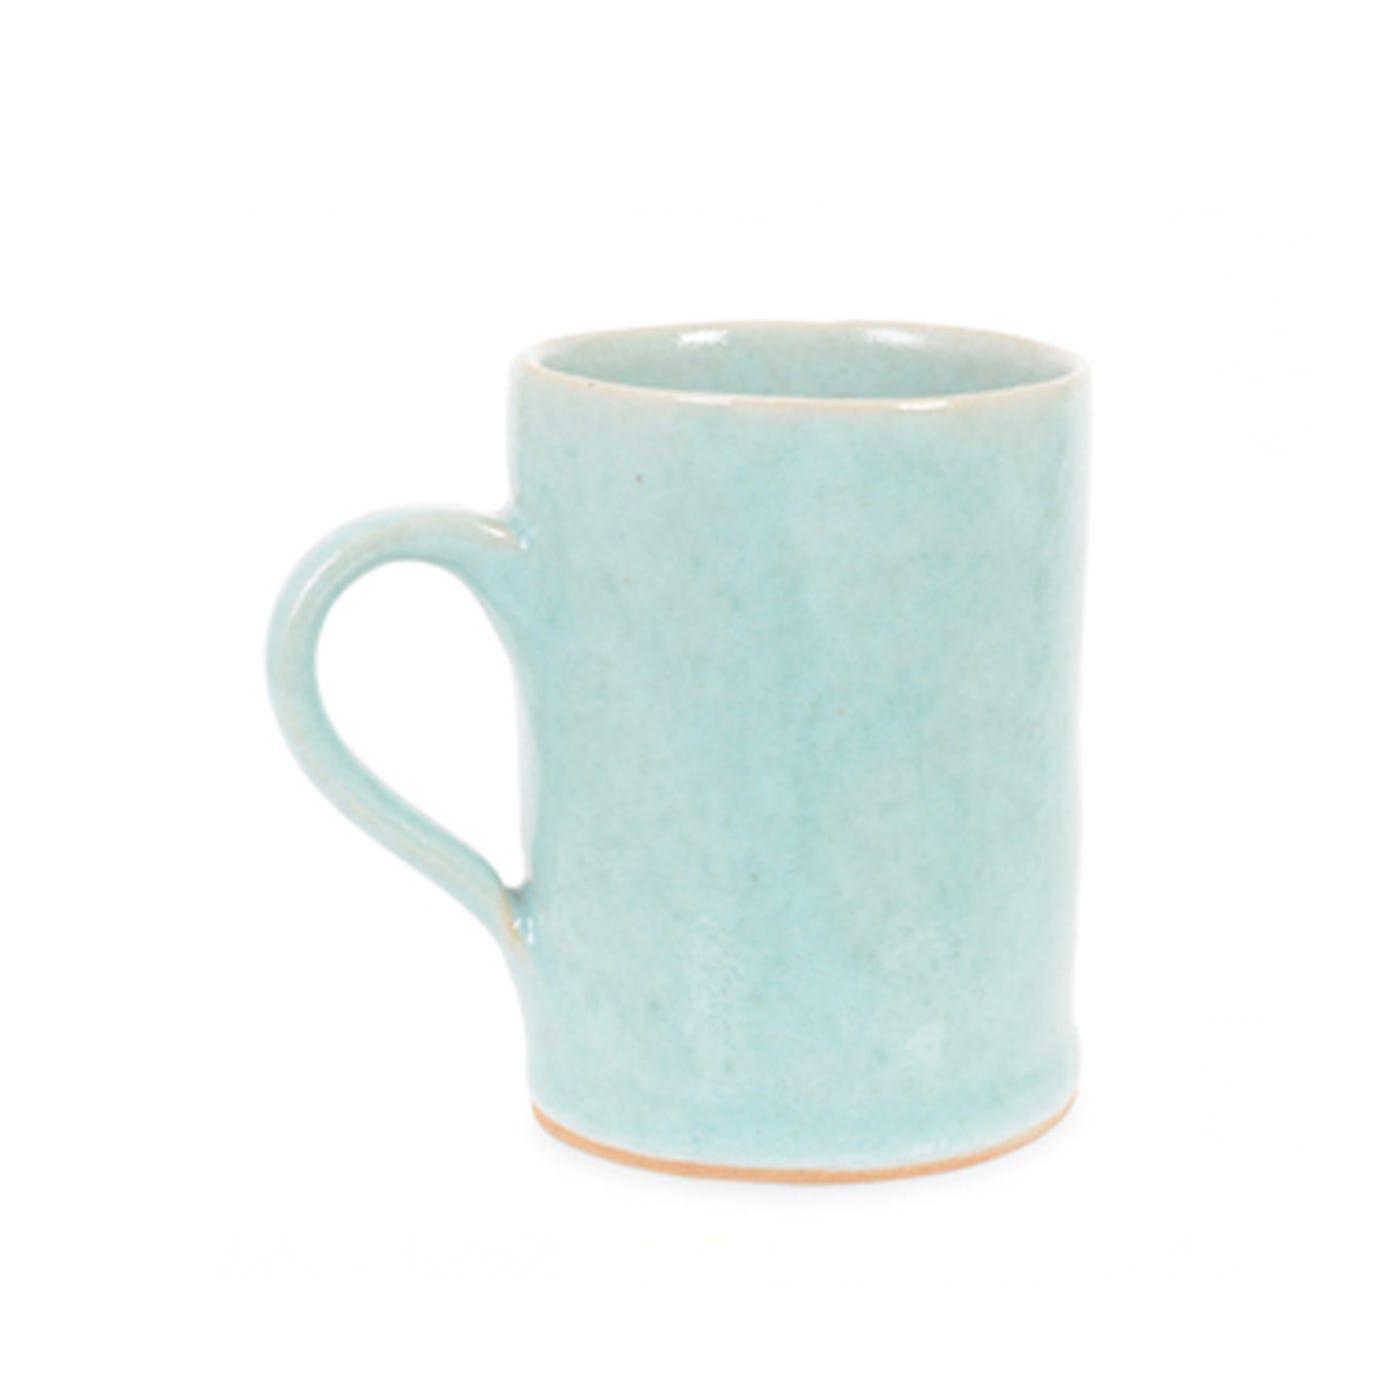 Teal Glaze Mug